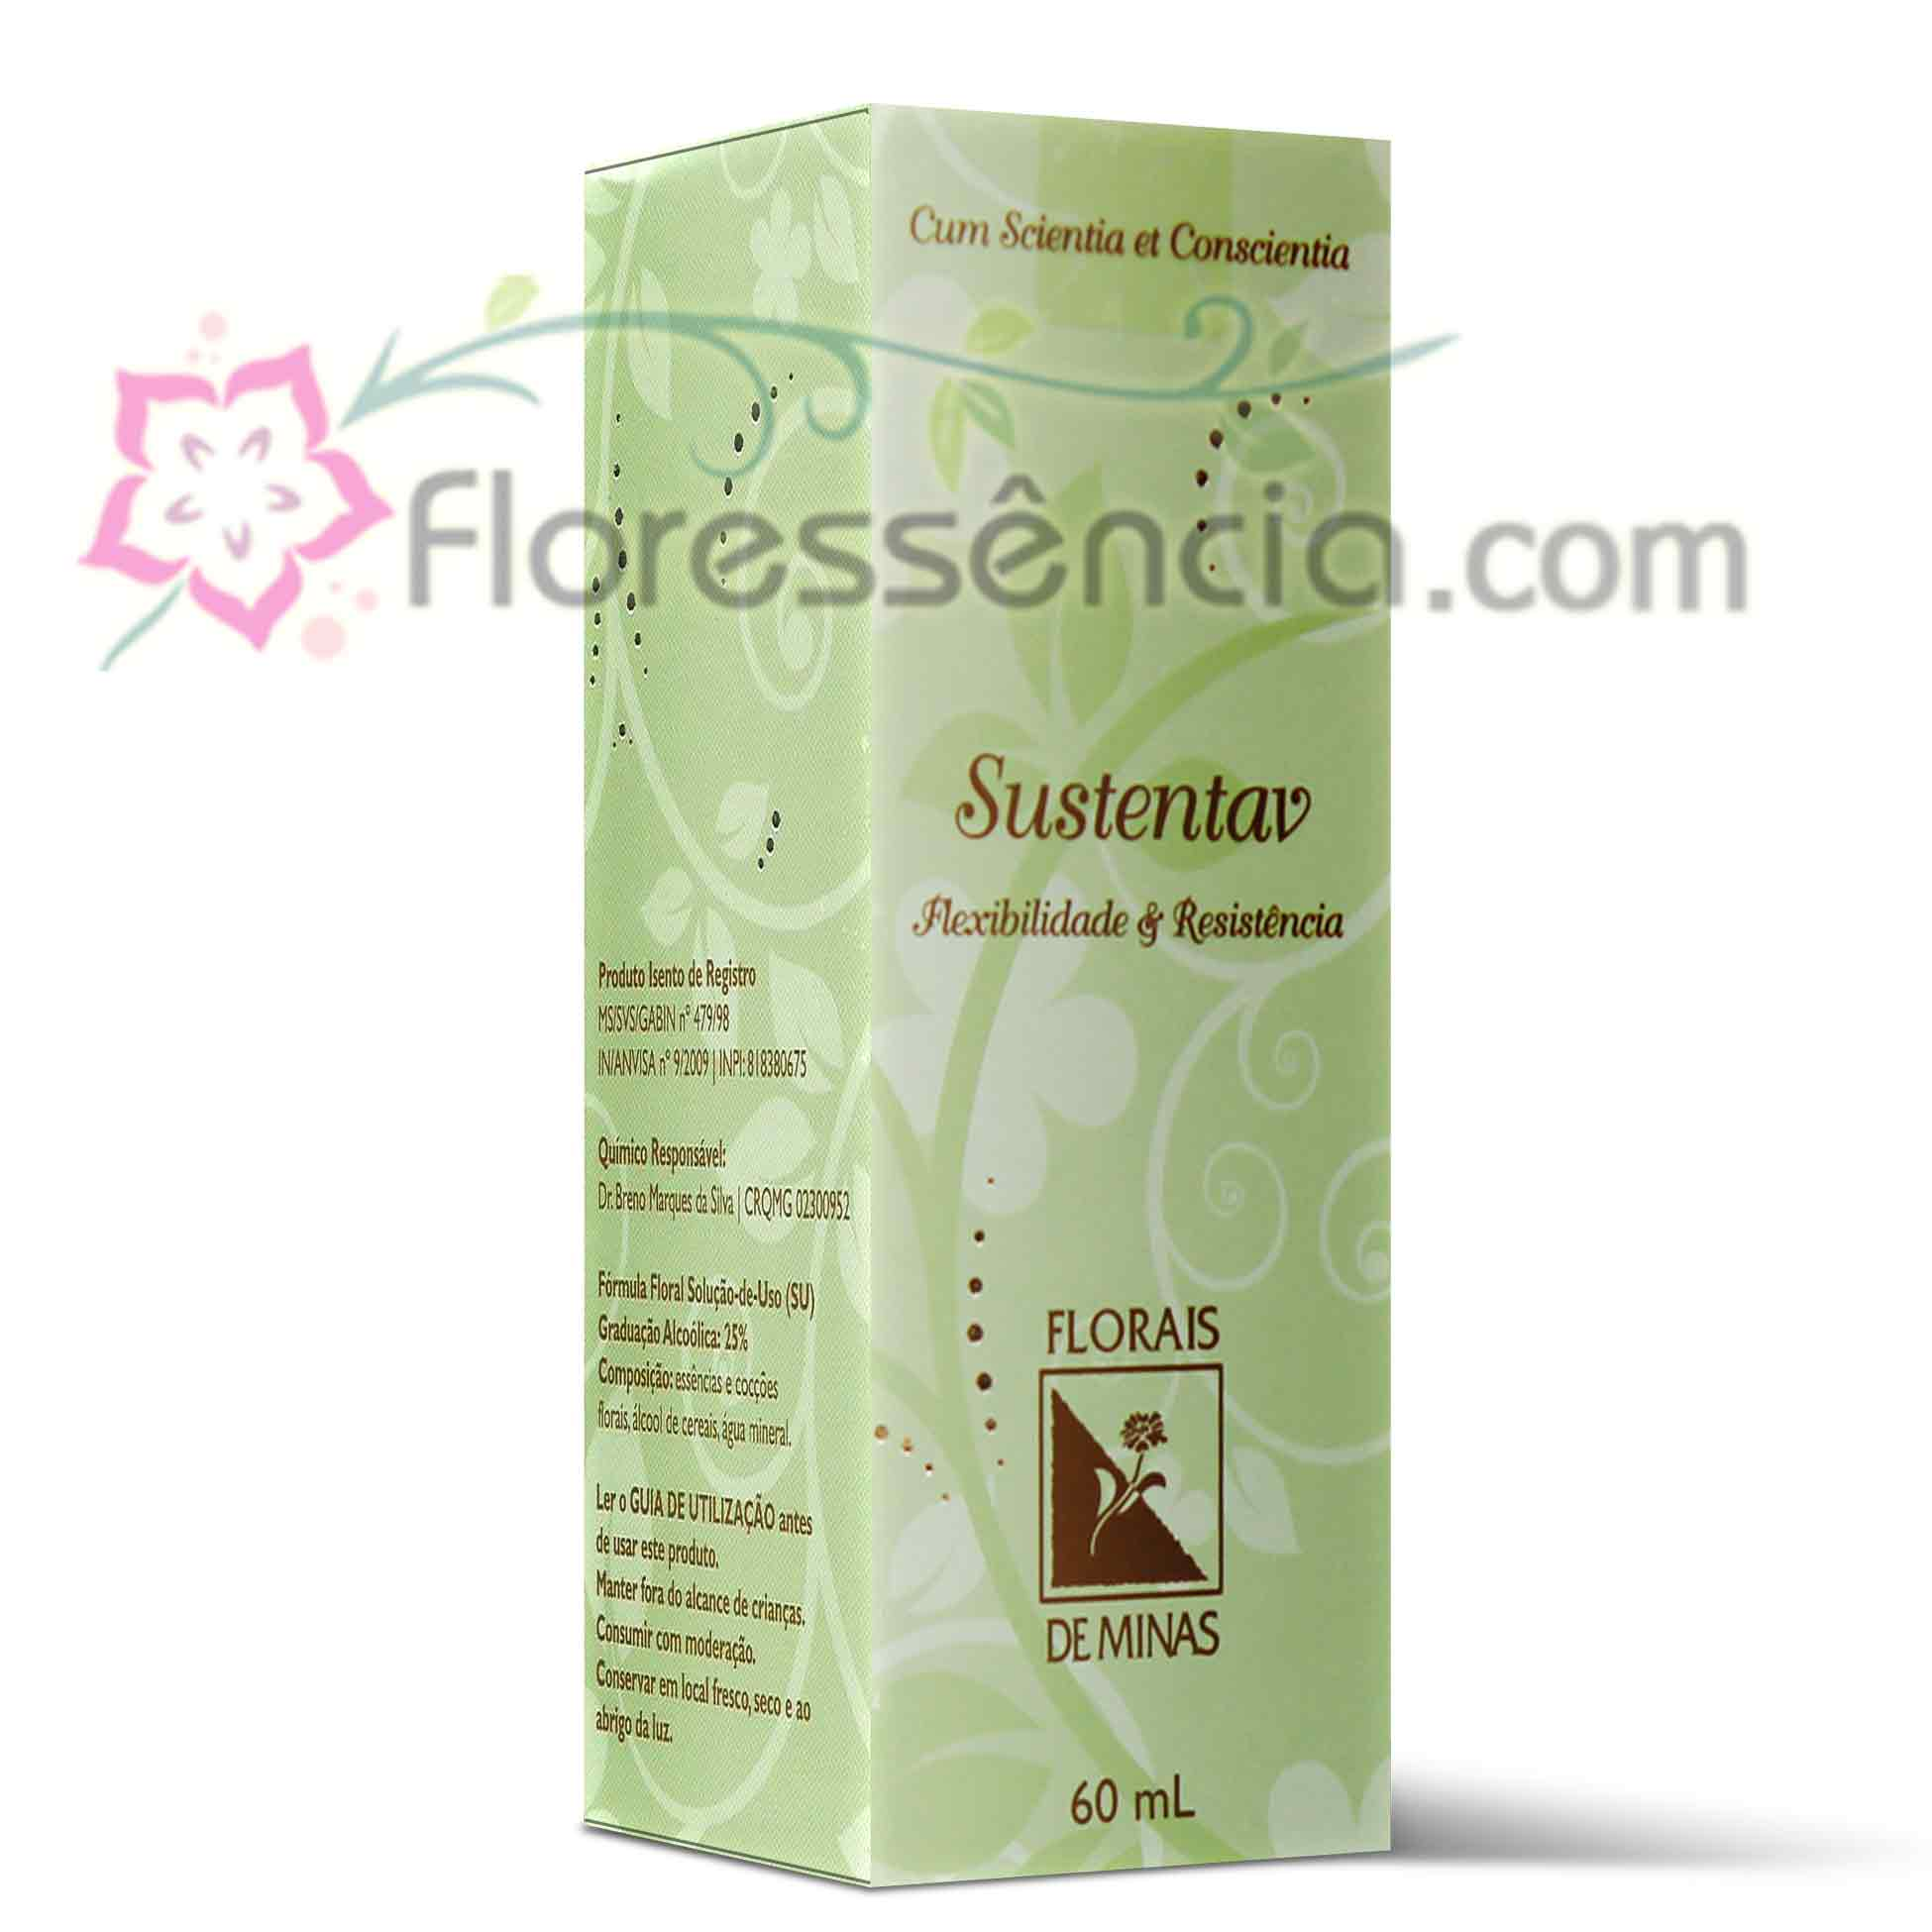 Sustentav - 60 ml  - Floressência